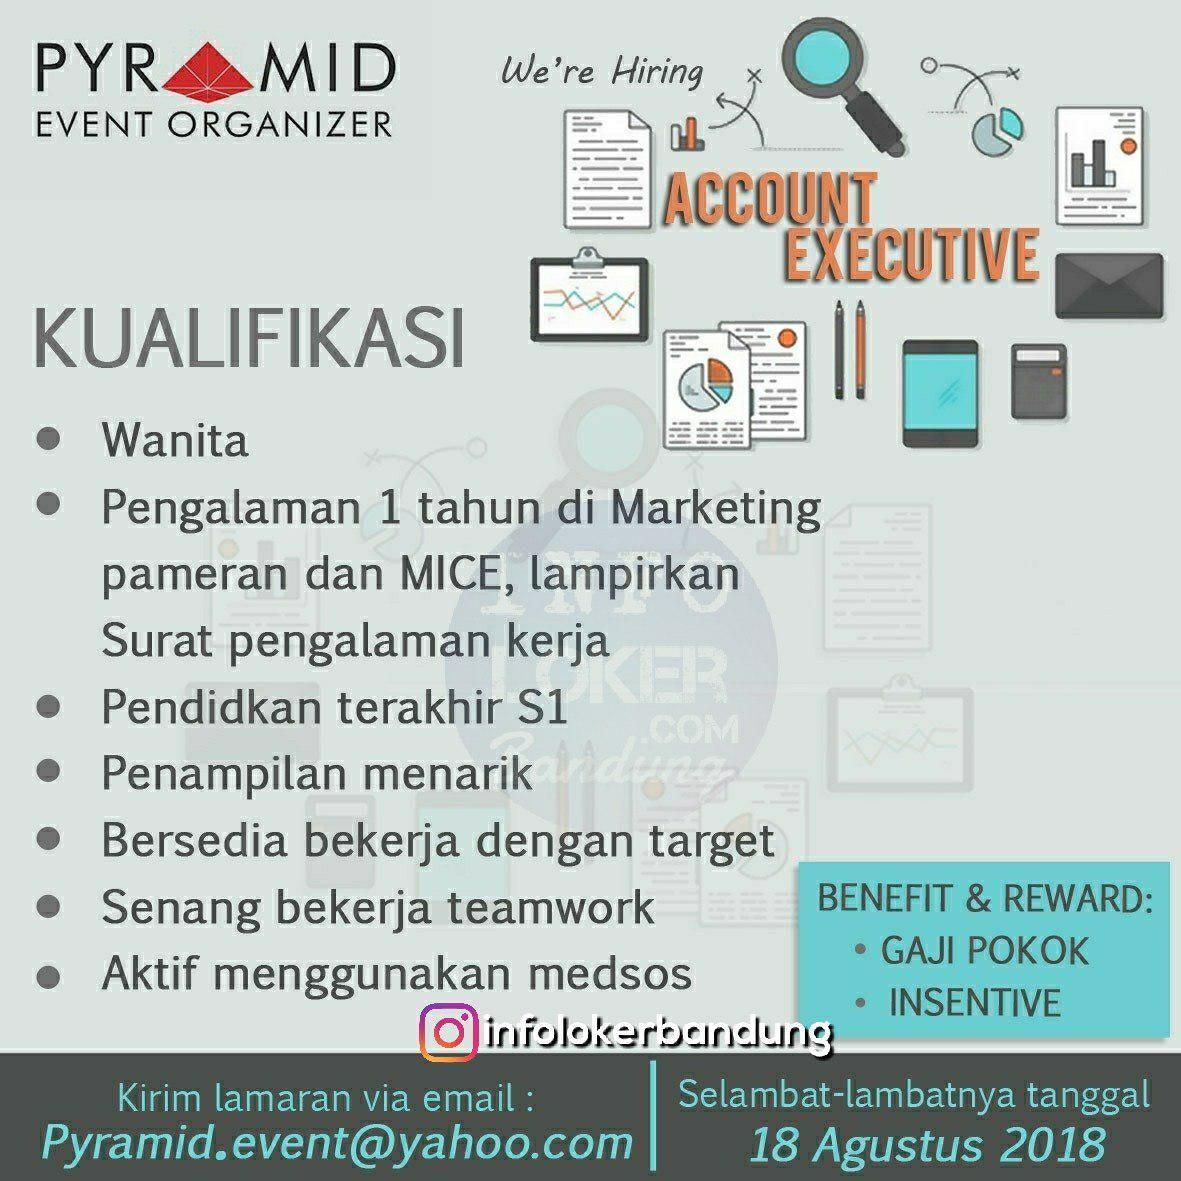 Lowongan Kerja Pyramid Event Organizer Bandung Agustus 2018